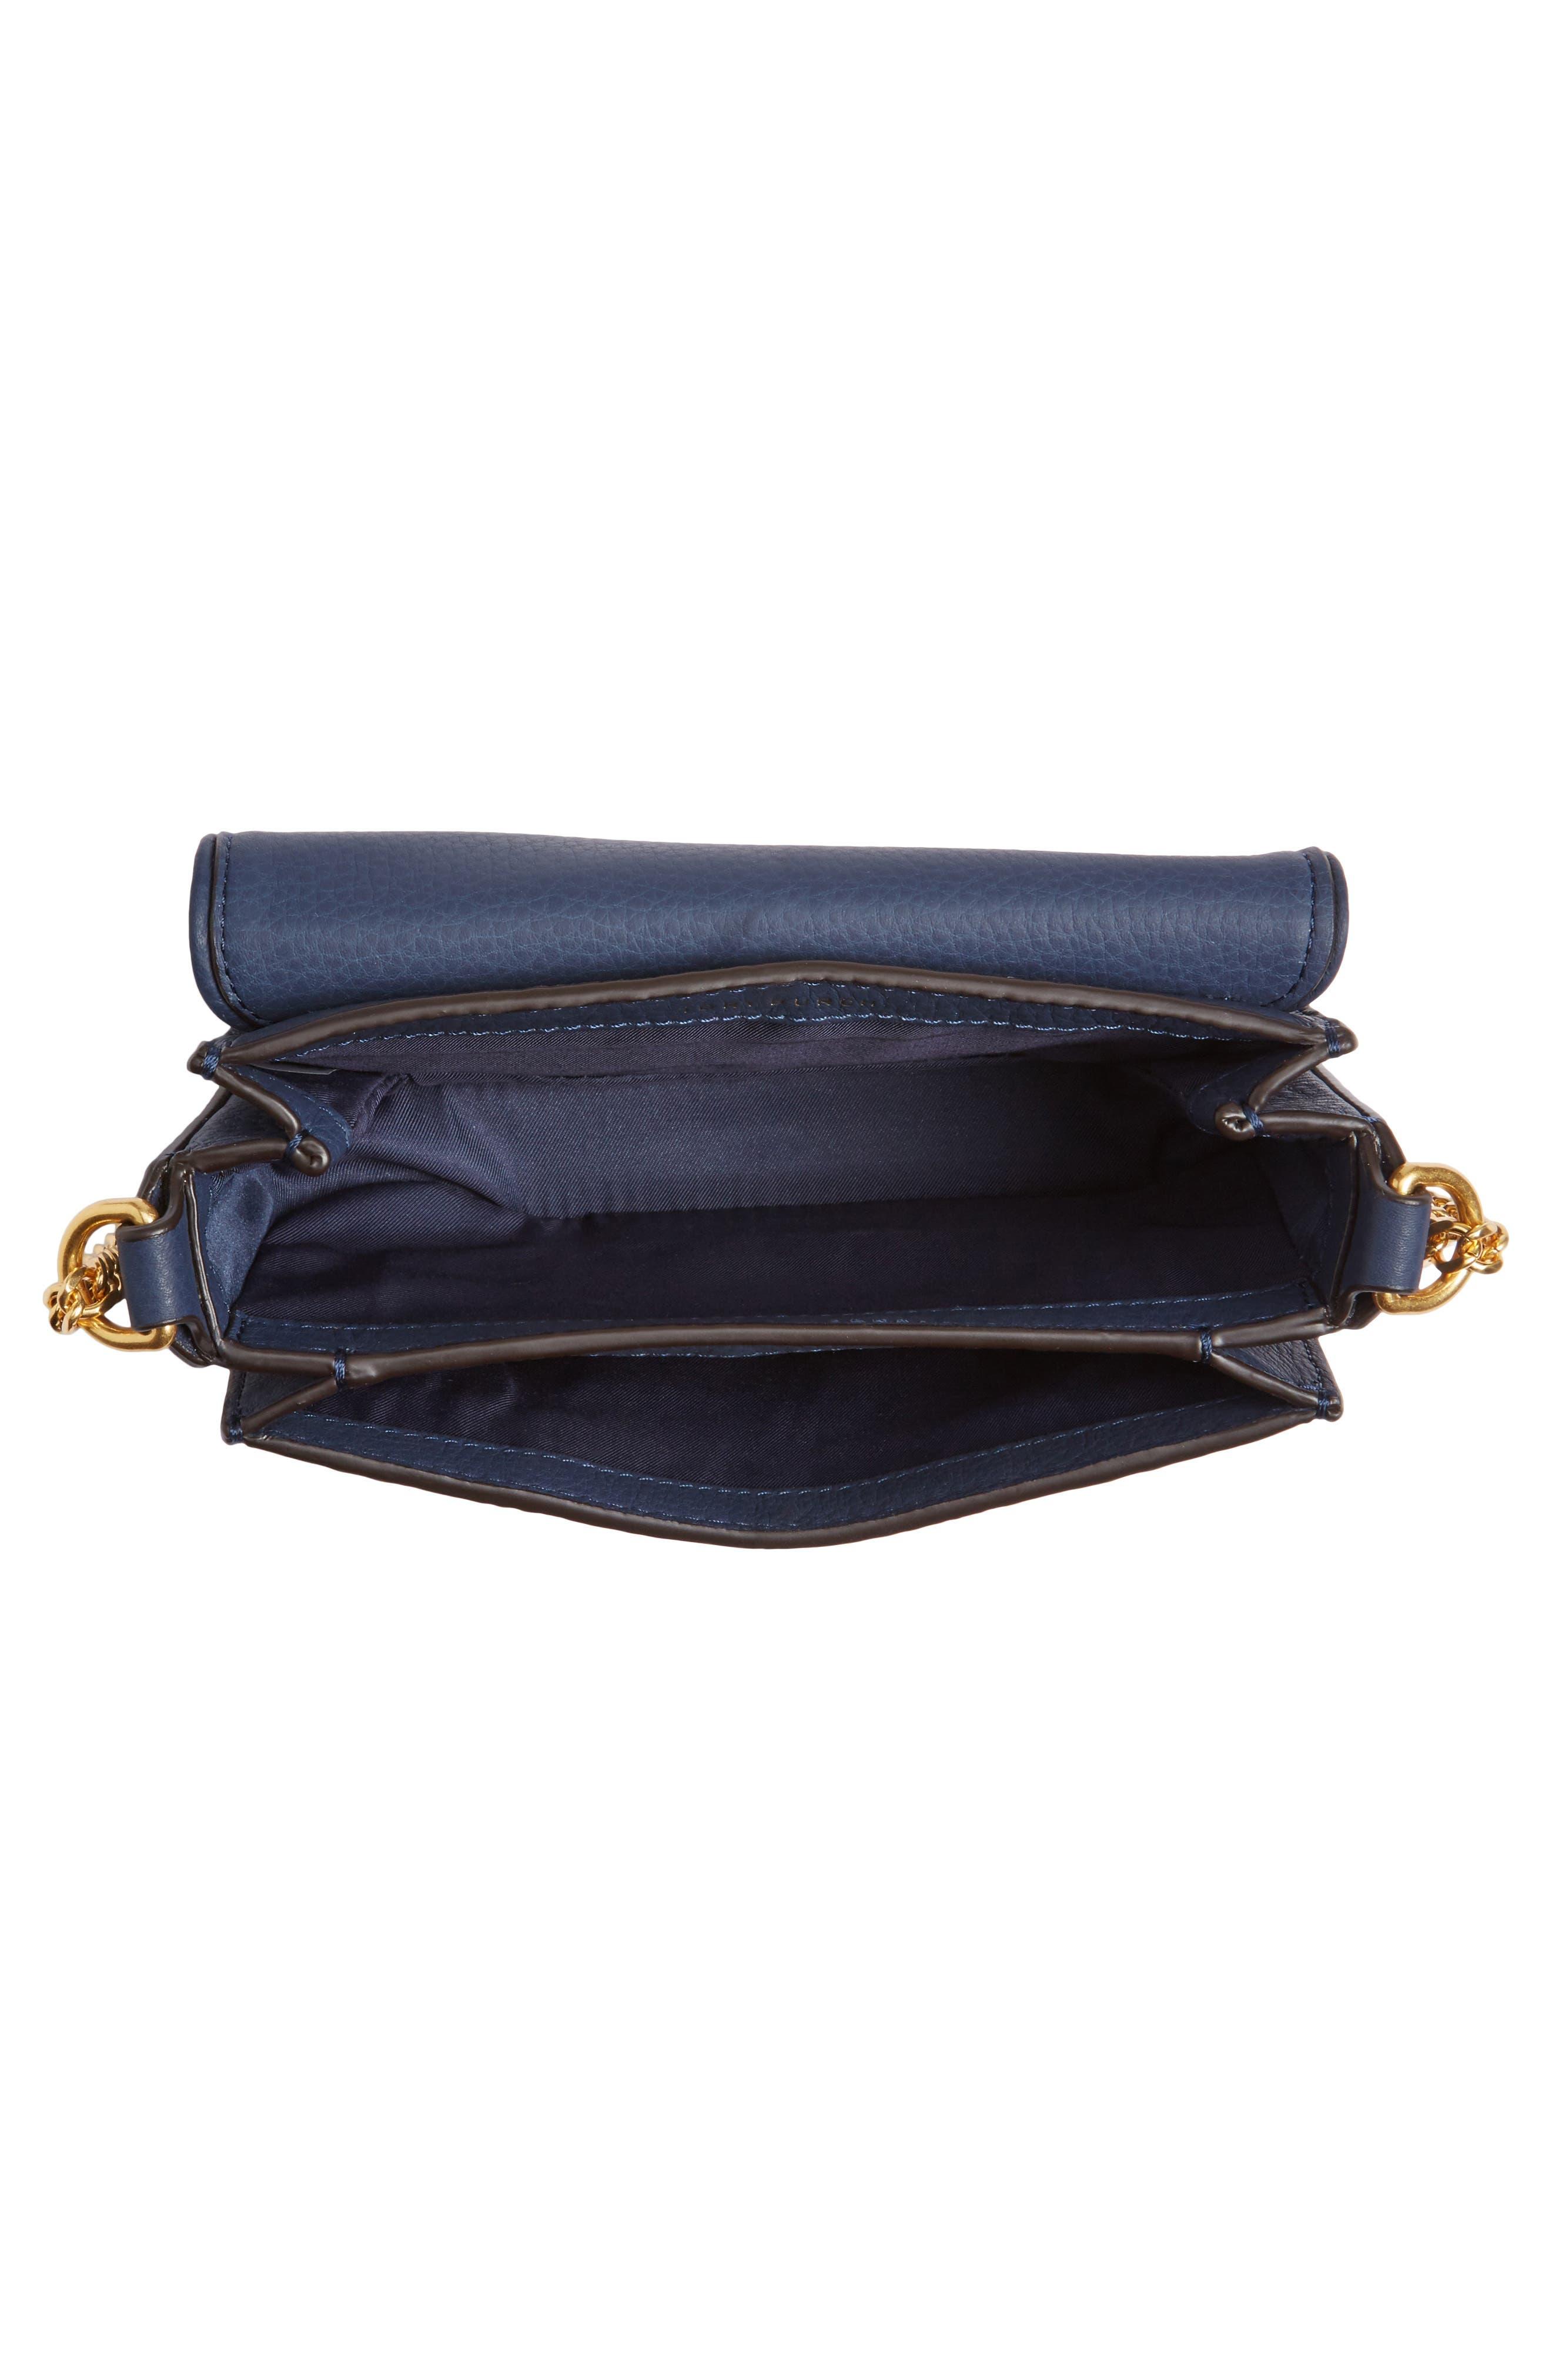 Mini Chelsea Leather Convertible Crossbody Bag,                             Alternate thumbnail 11, color,